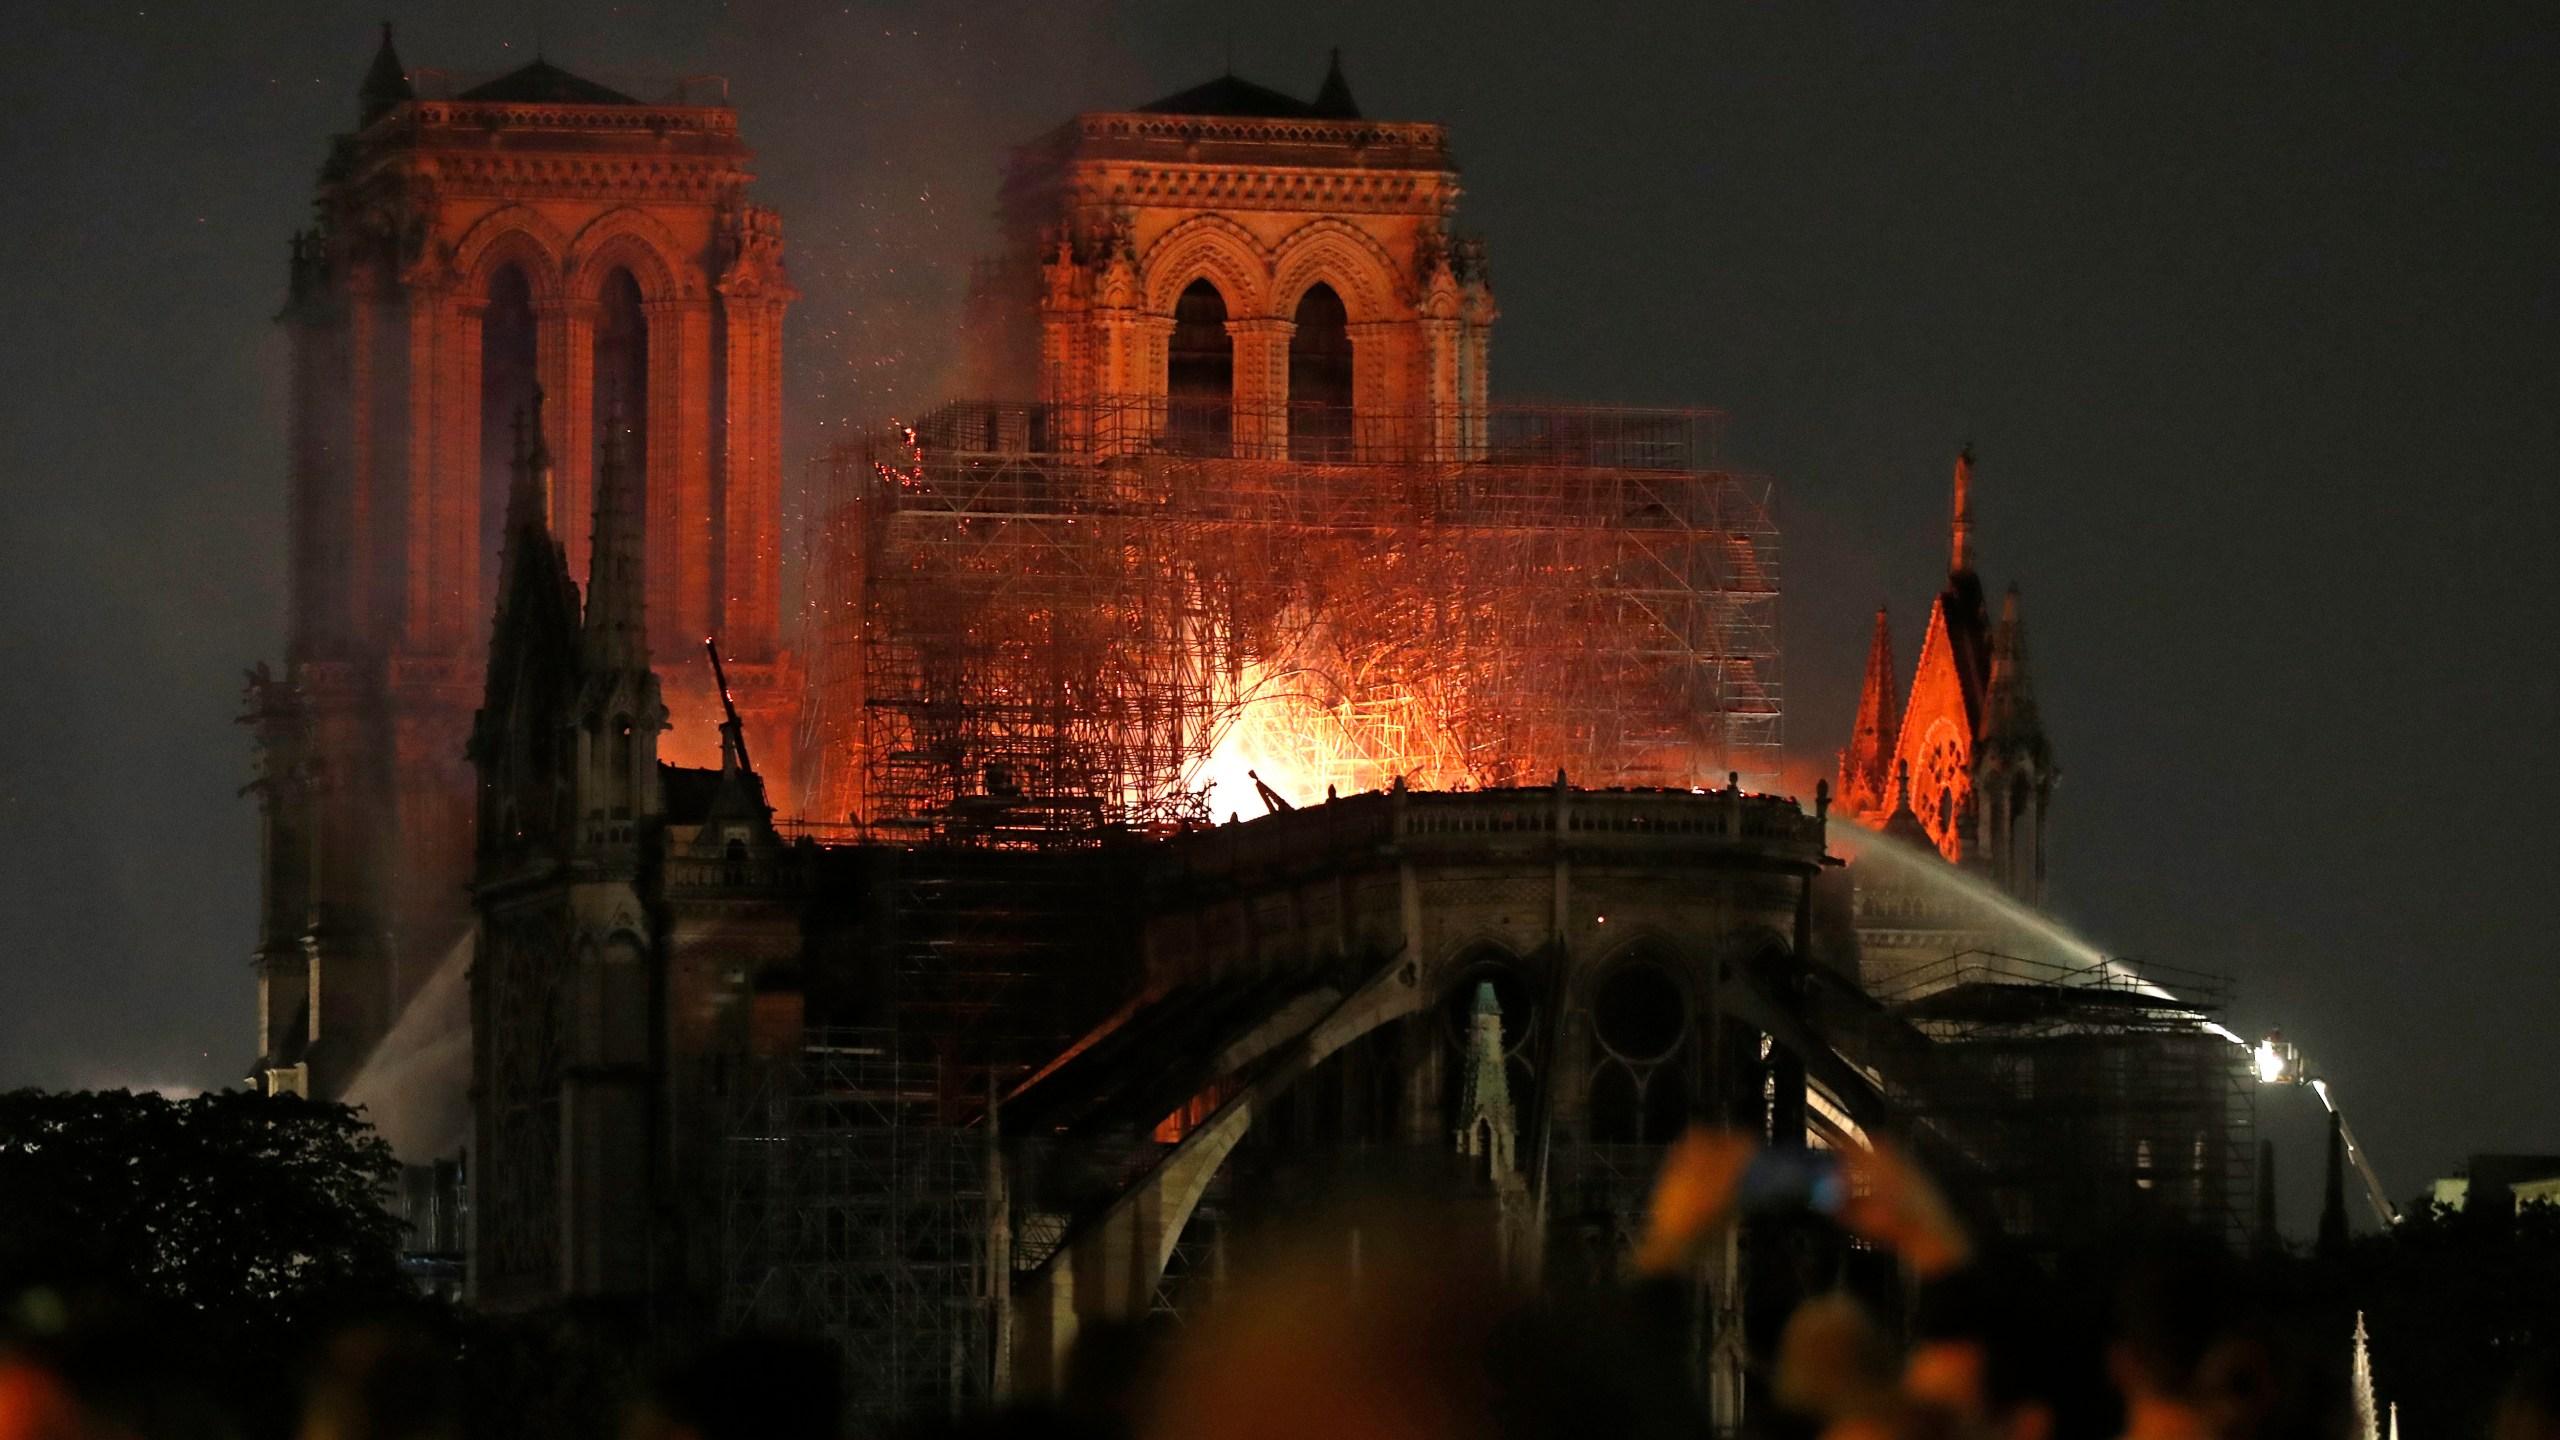 France_Notre_Dame_Fire_00969-159532.jpg67213089